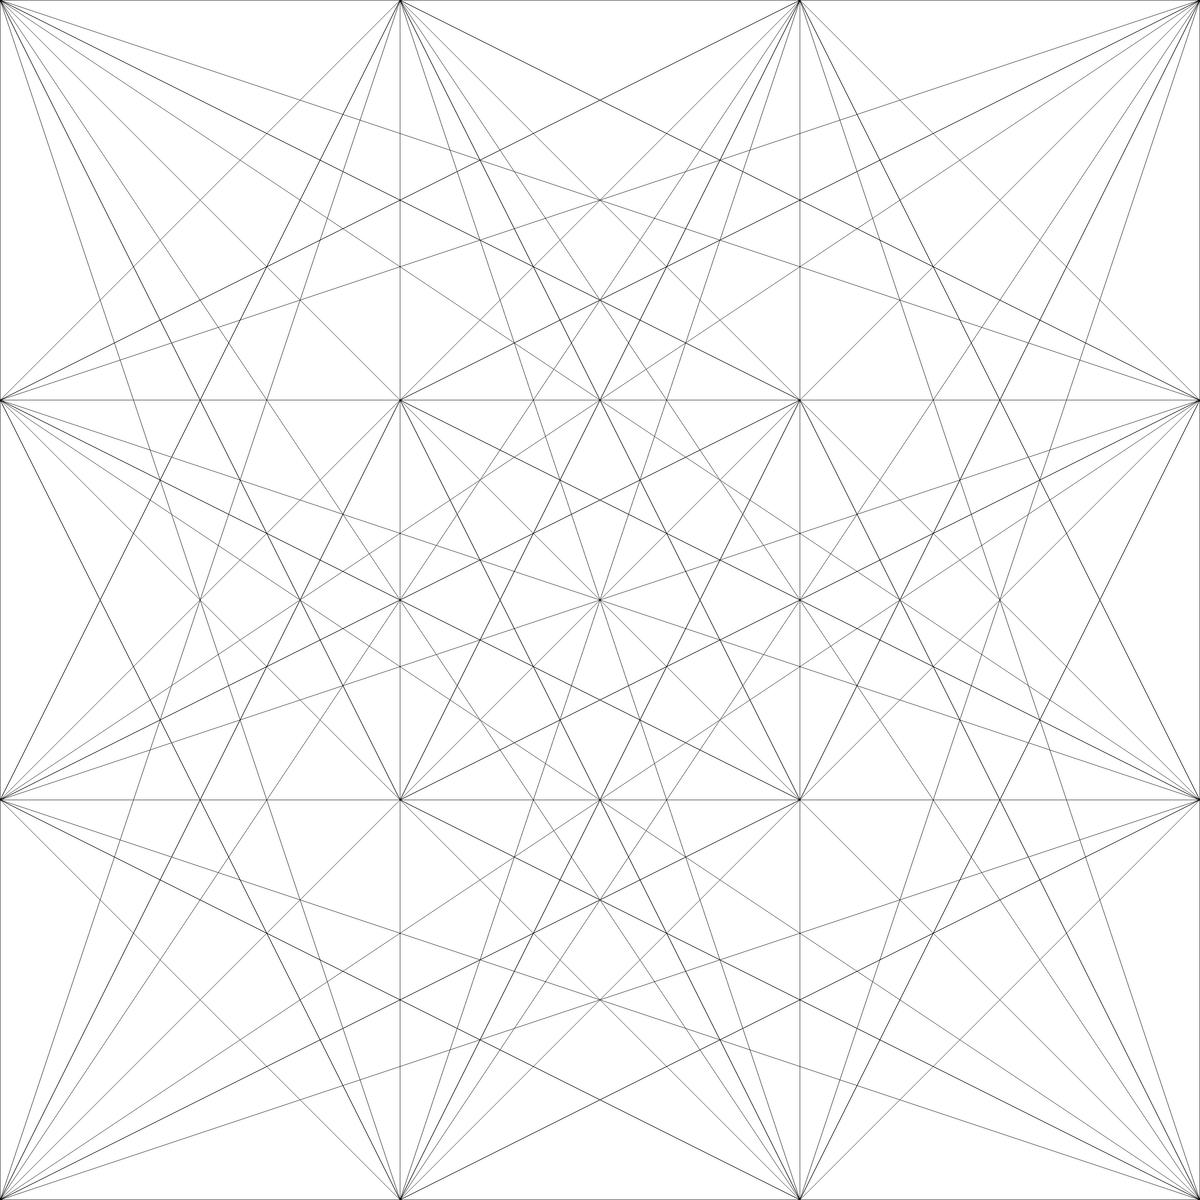 f:id:Hassium277:20200215213900p:plain